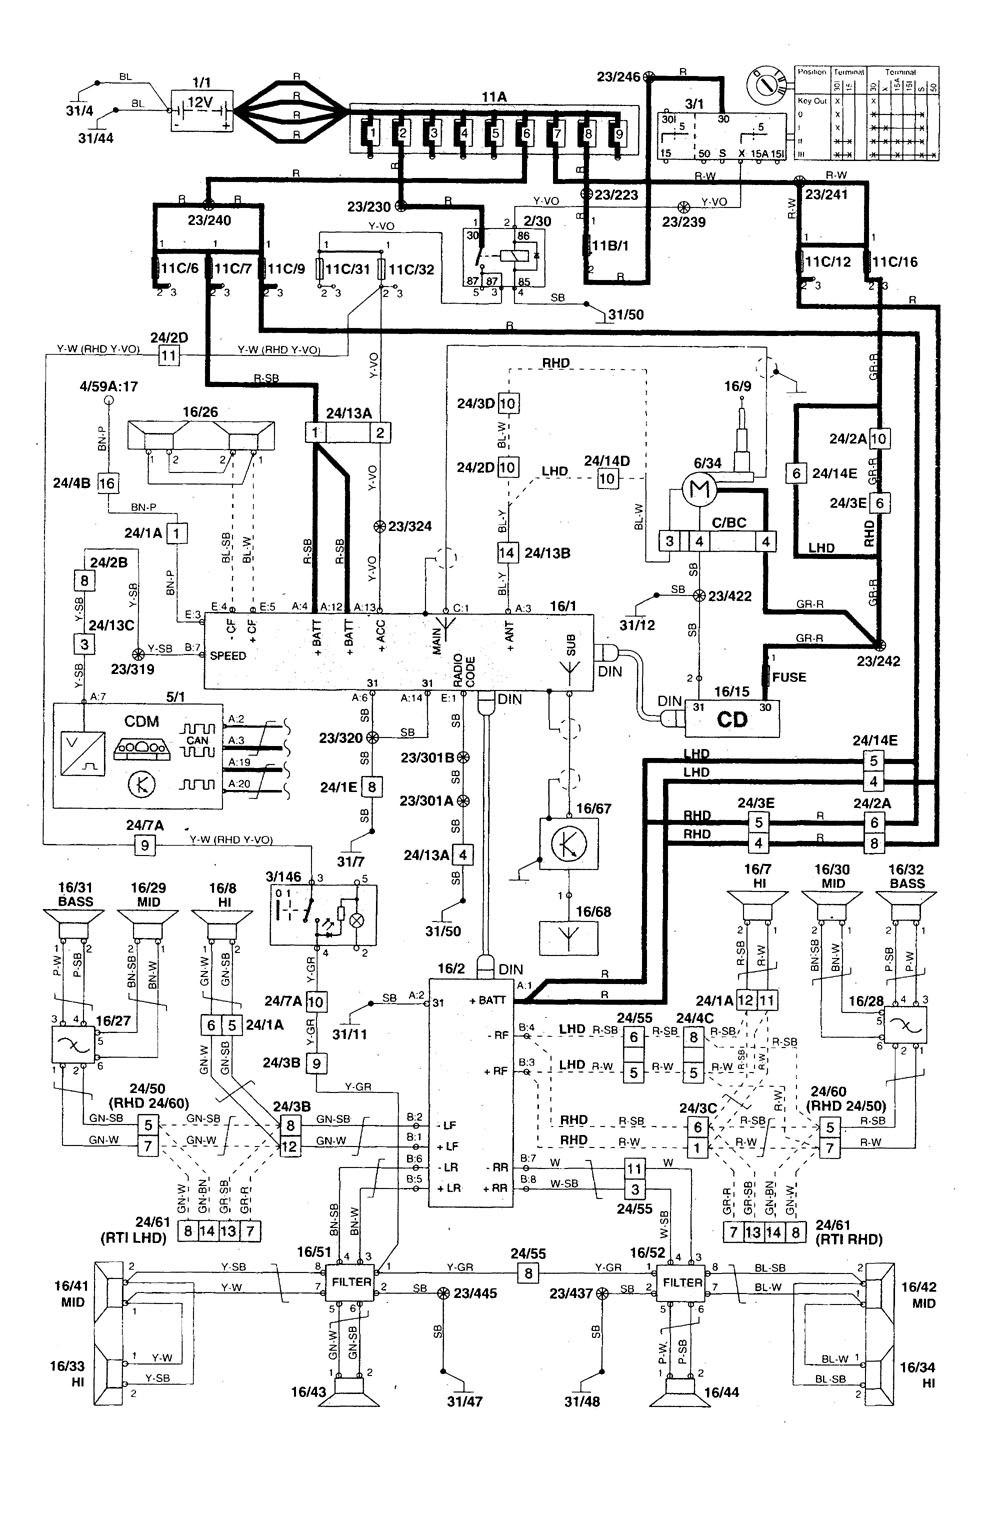 Volvo C70 (1998 - 2004) - wiring diagrams - audio - Carknowledge.info | Volvo Wiring Diagrams C70 |  | Carknowledge.info